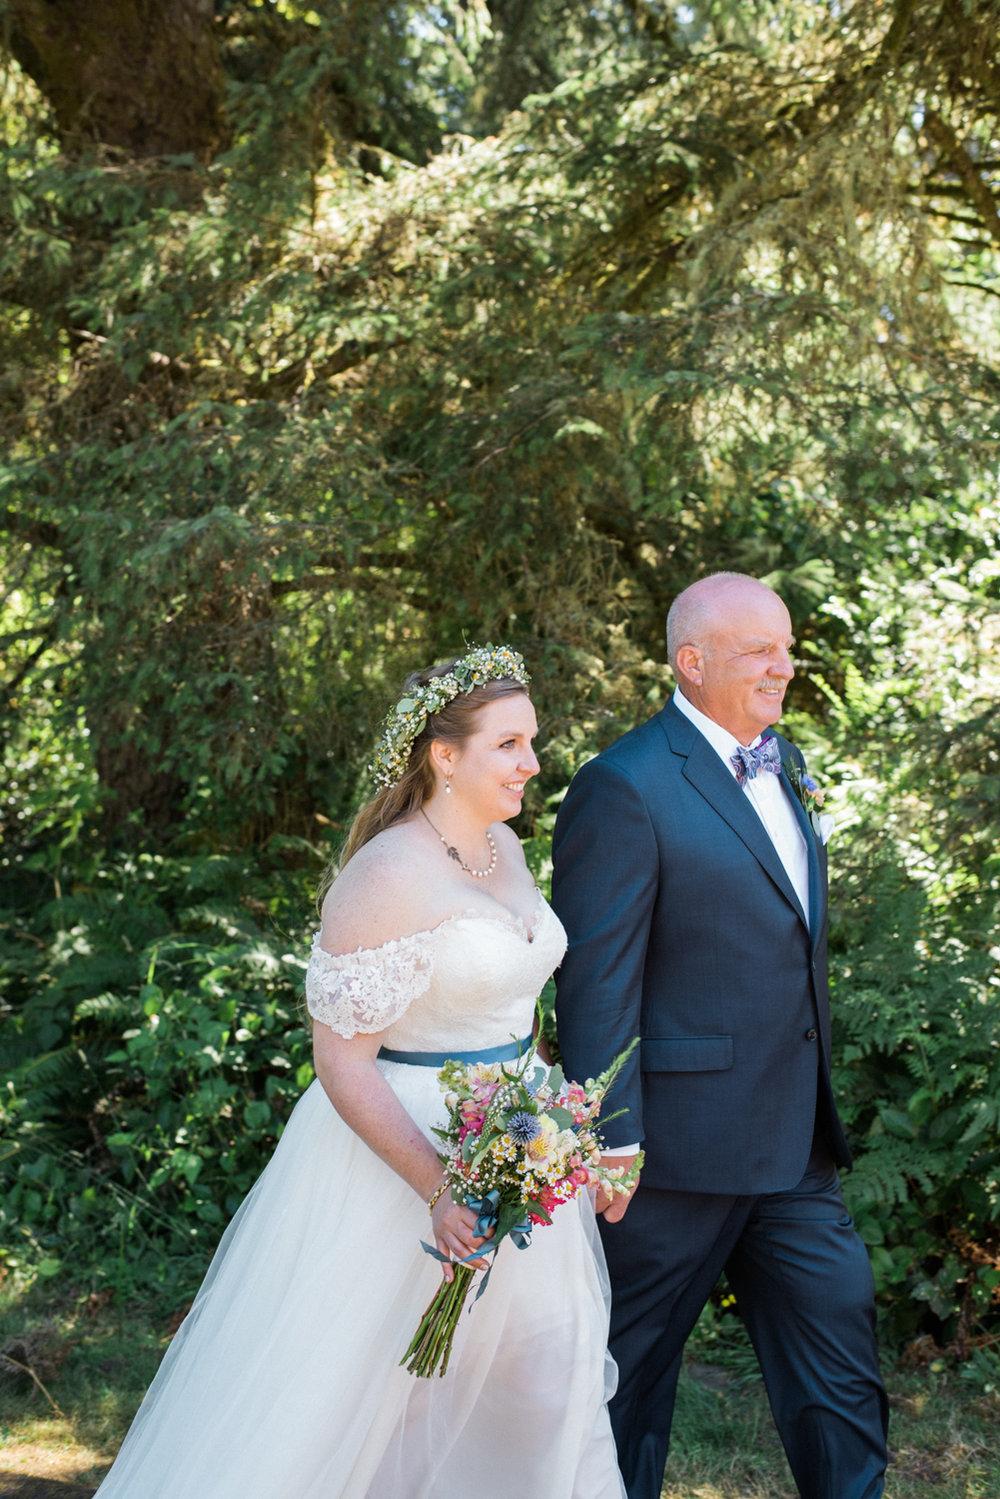 astoria-wedding-fort-stevens-oregon-kc-shelley-marie-photo-0522.jpg